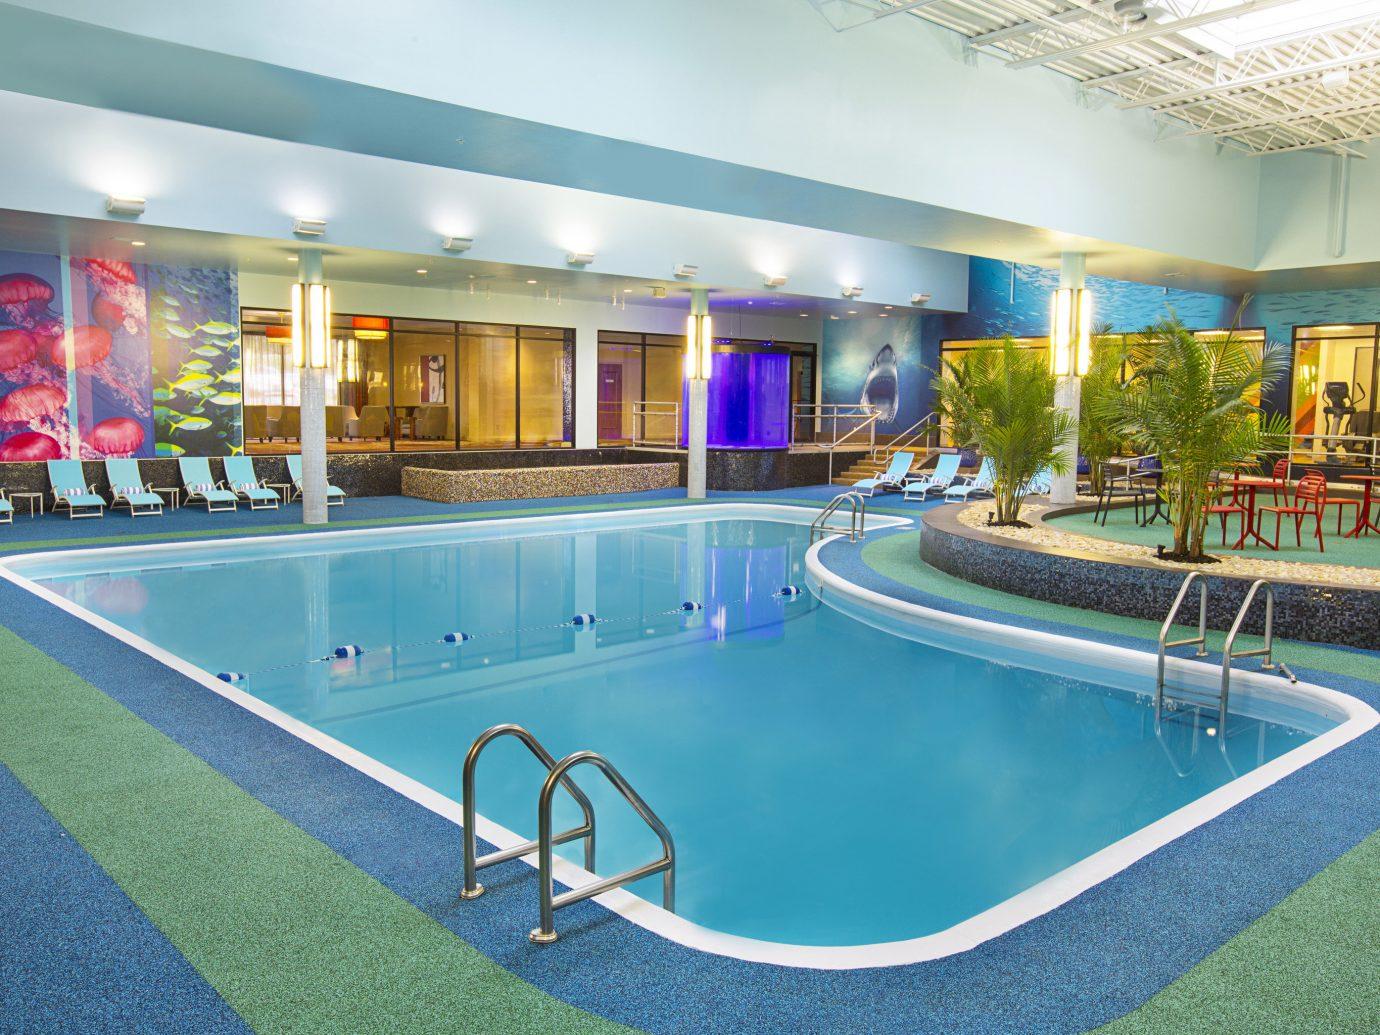 Hotels leisure leisure centre swimming pool ceiling real estate Resort recreation resort town estate hotel water thermae condominium amenity blue